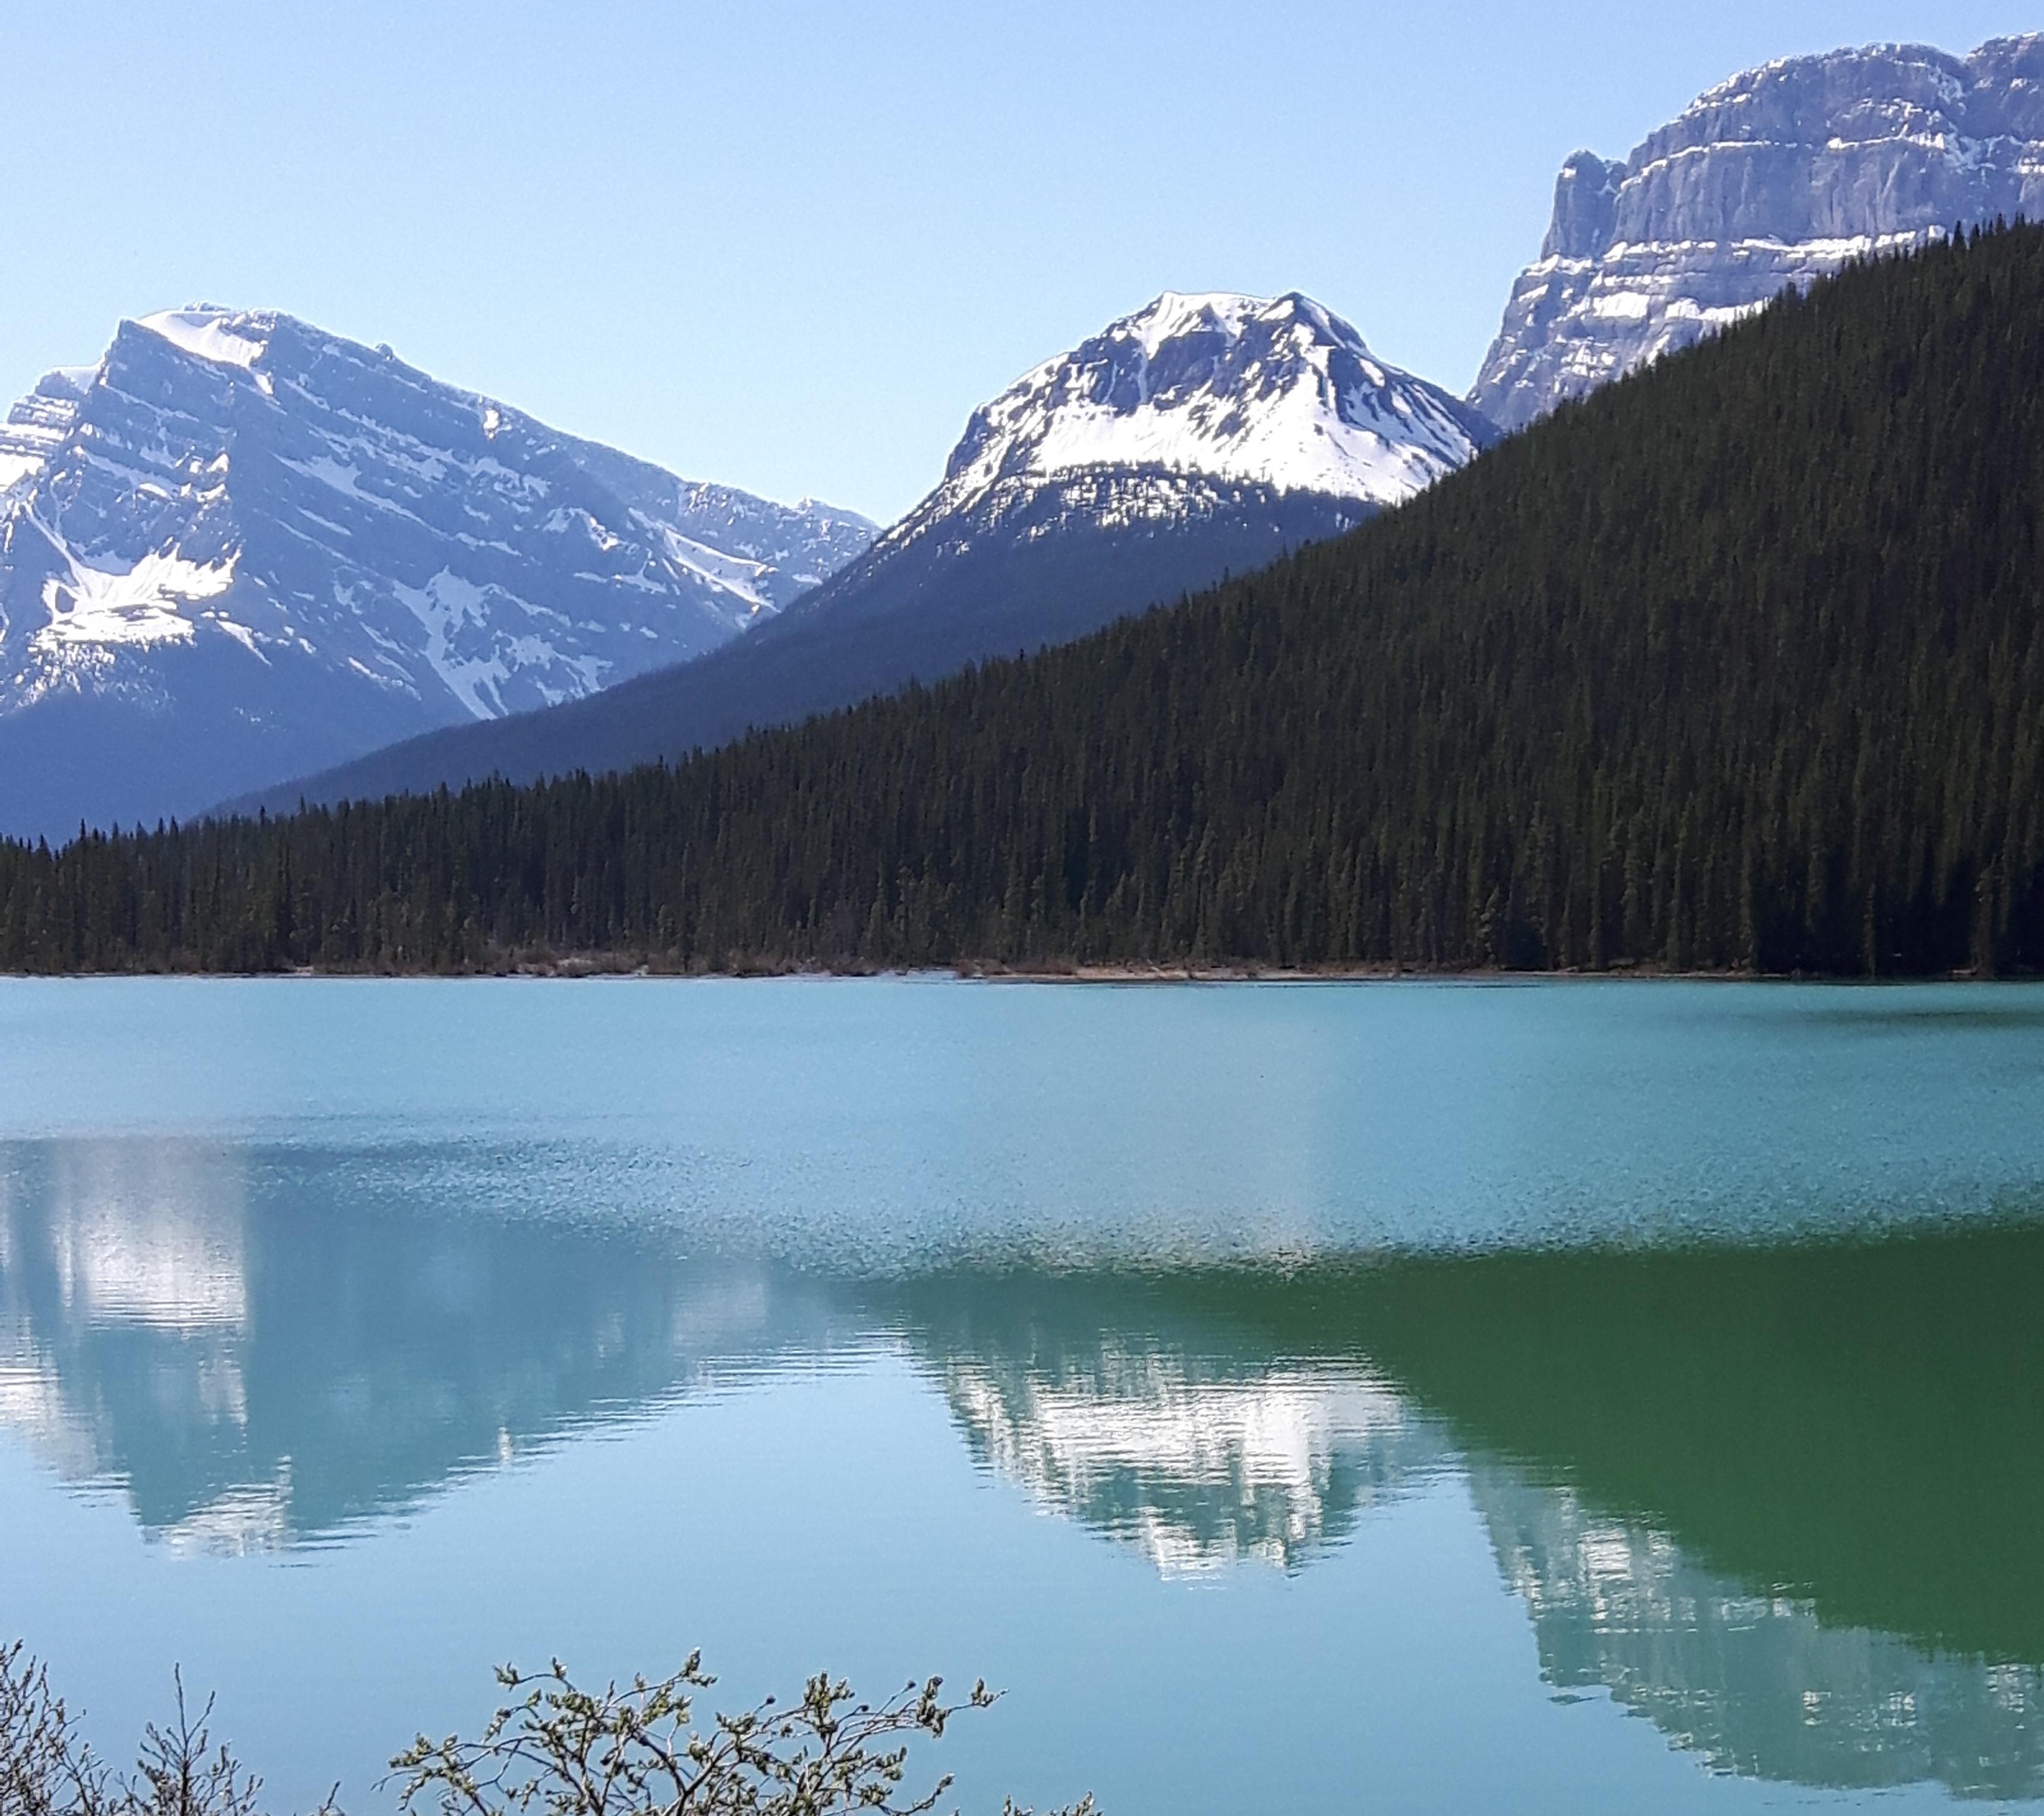 Bow Lake, Icefield Parkway, Alberta